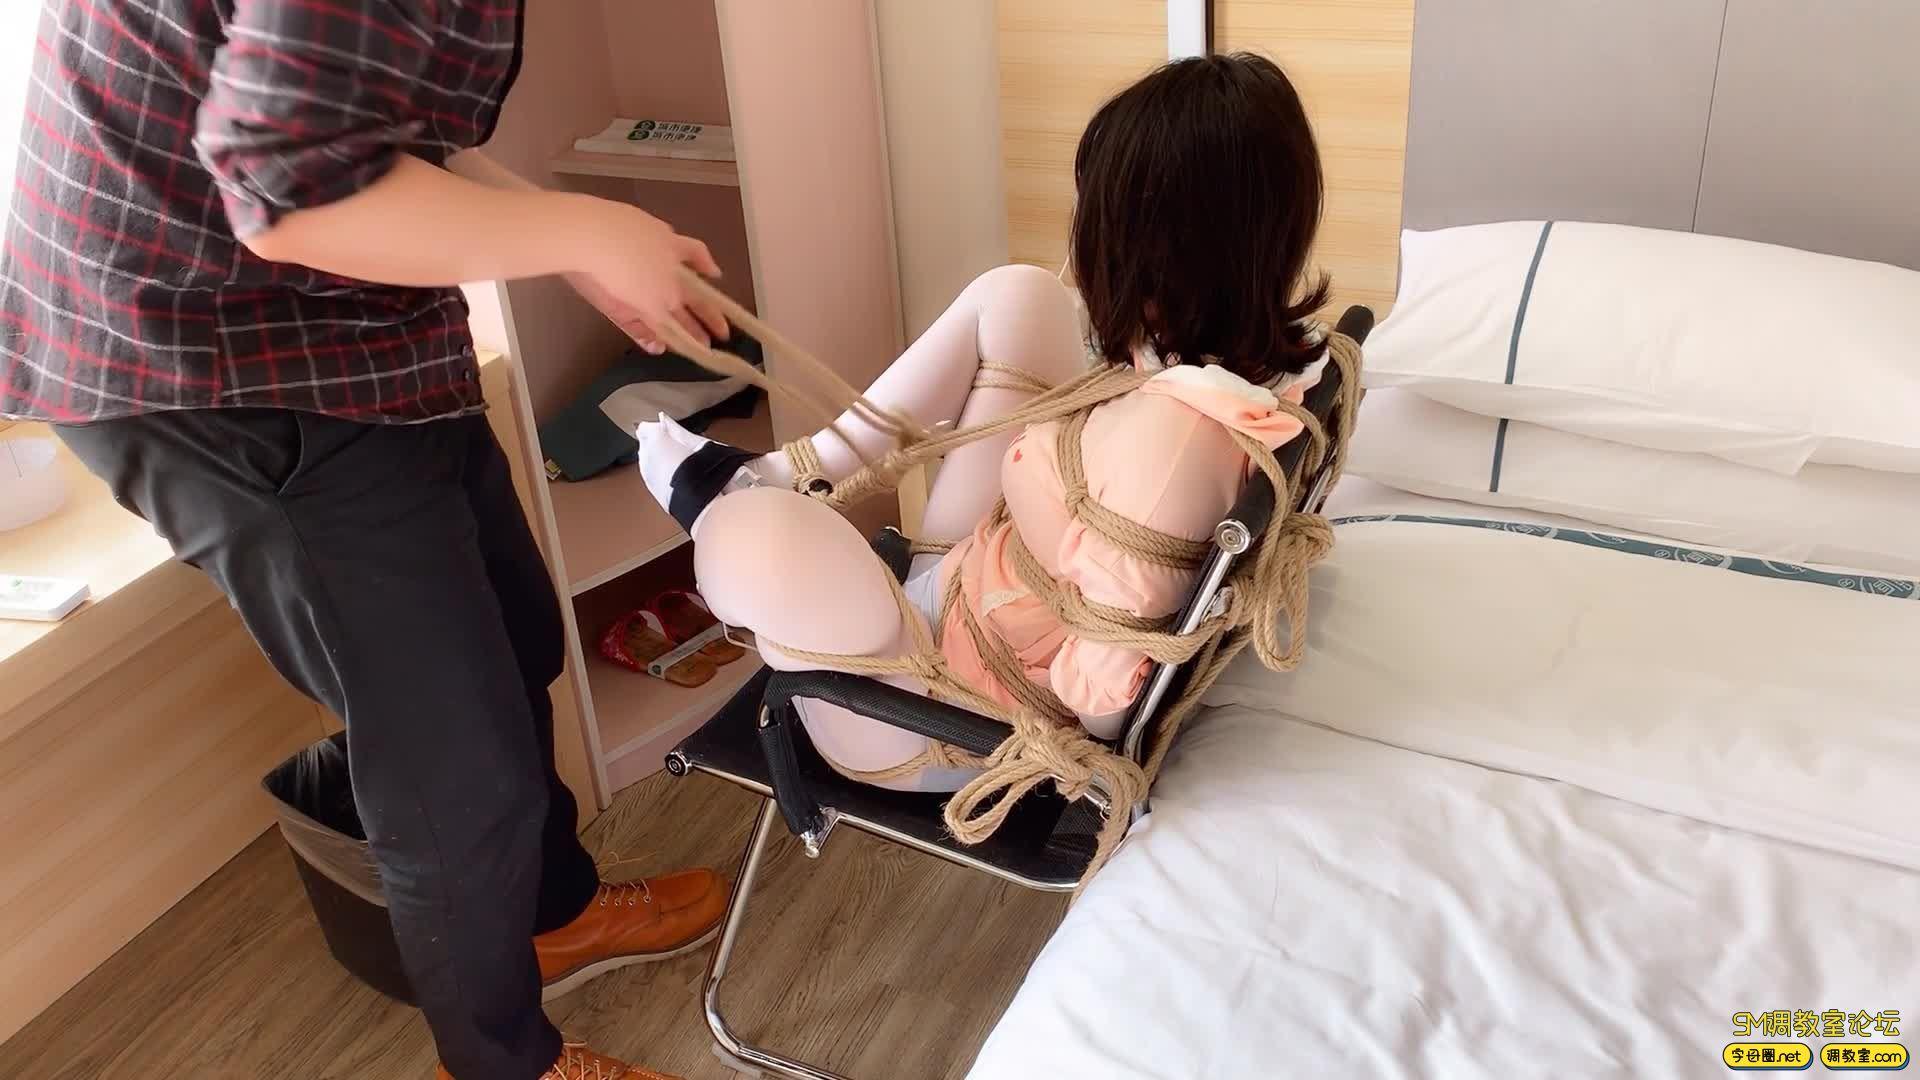 【HUI】_小姐姐又哭了,超紧驷马捆绑-视频截图4